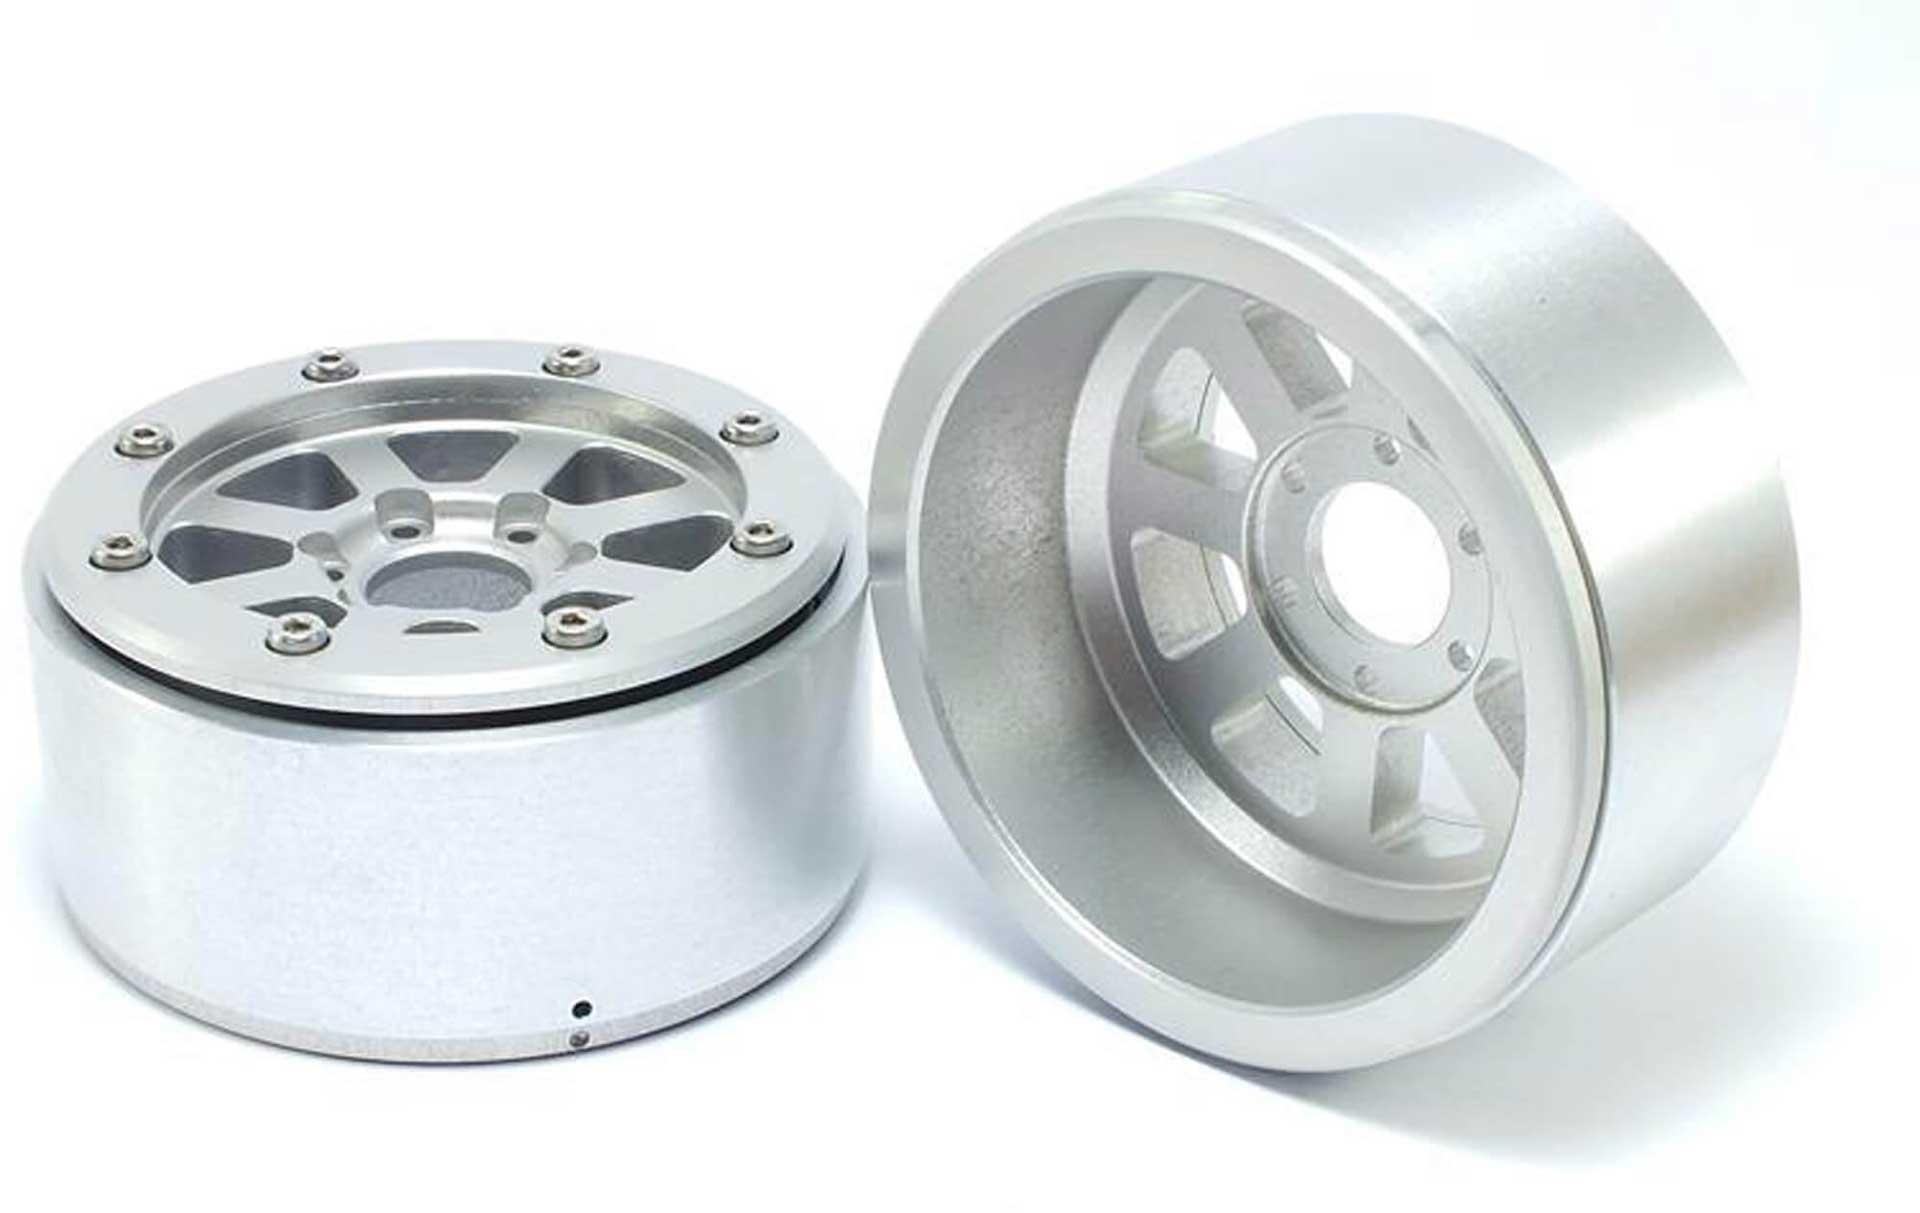 Metsafil Beadlock Wheels HAMMER silber/silber 1.9 (2 St.) ohne Radnabe